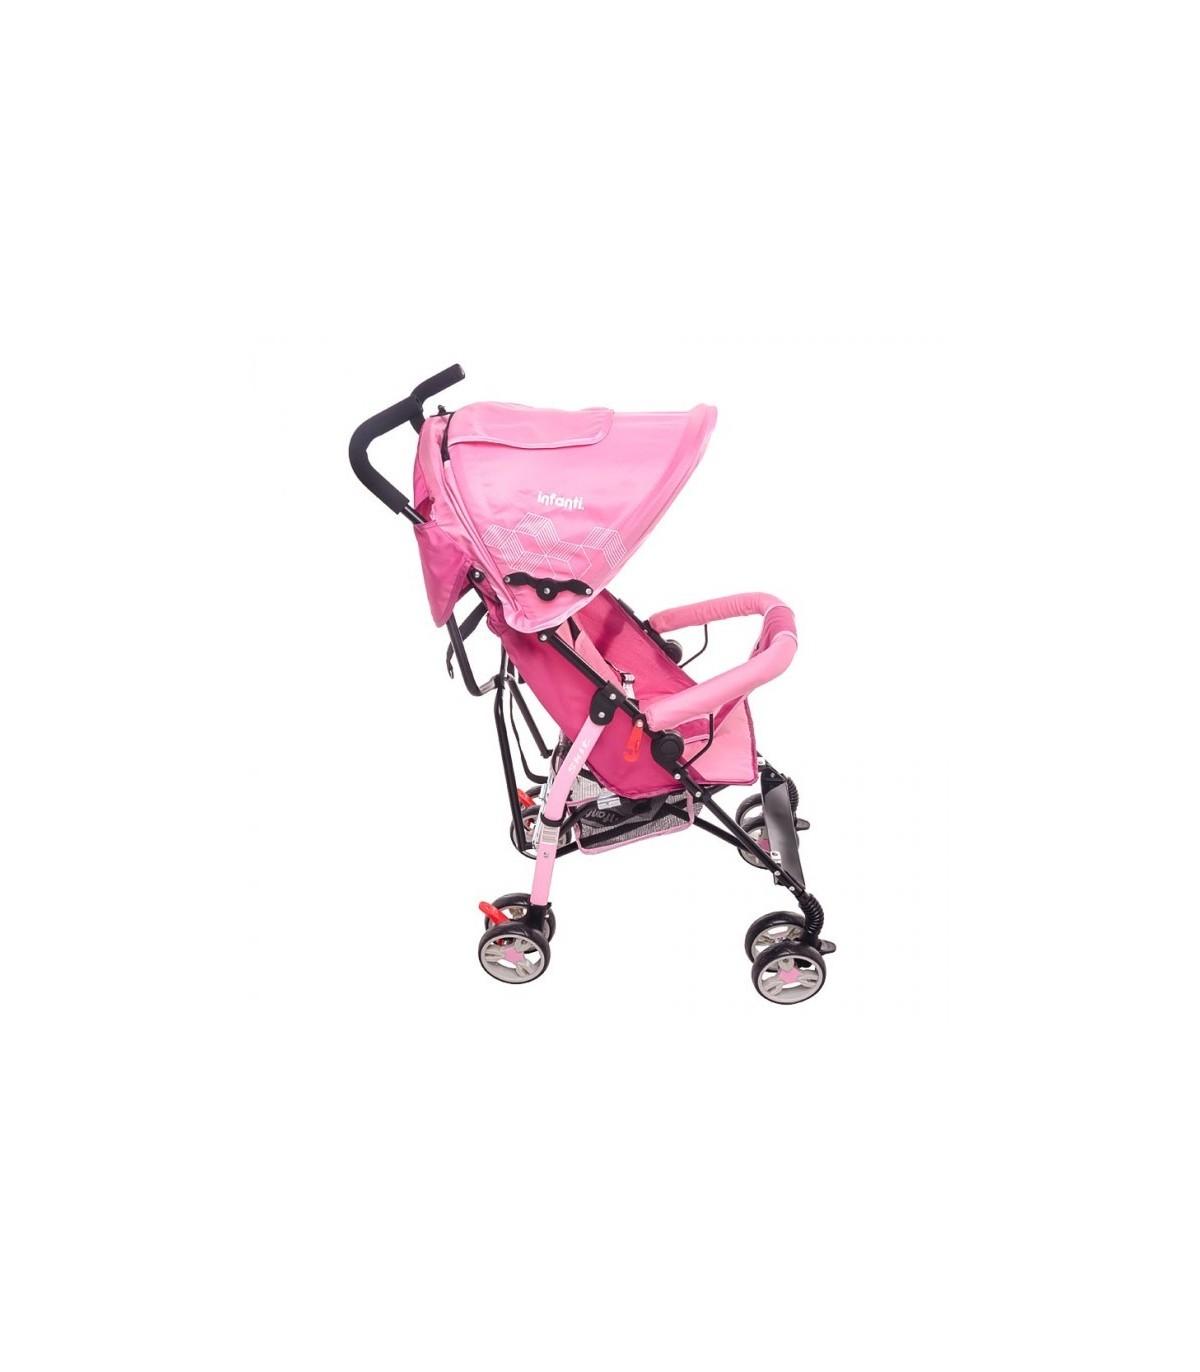 6ed2c4bae Carreolas Nuevas De Bastón Infanti Skit Pink Carreola